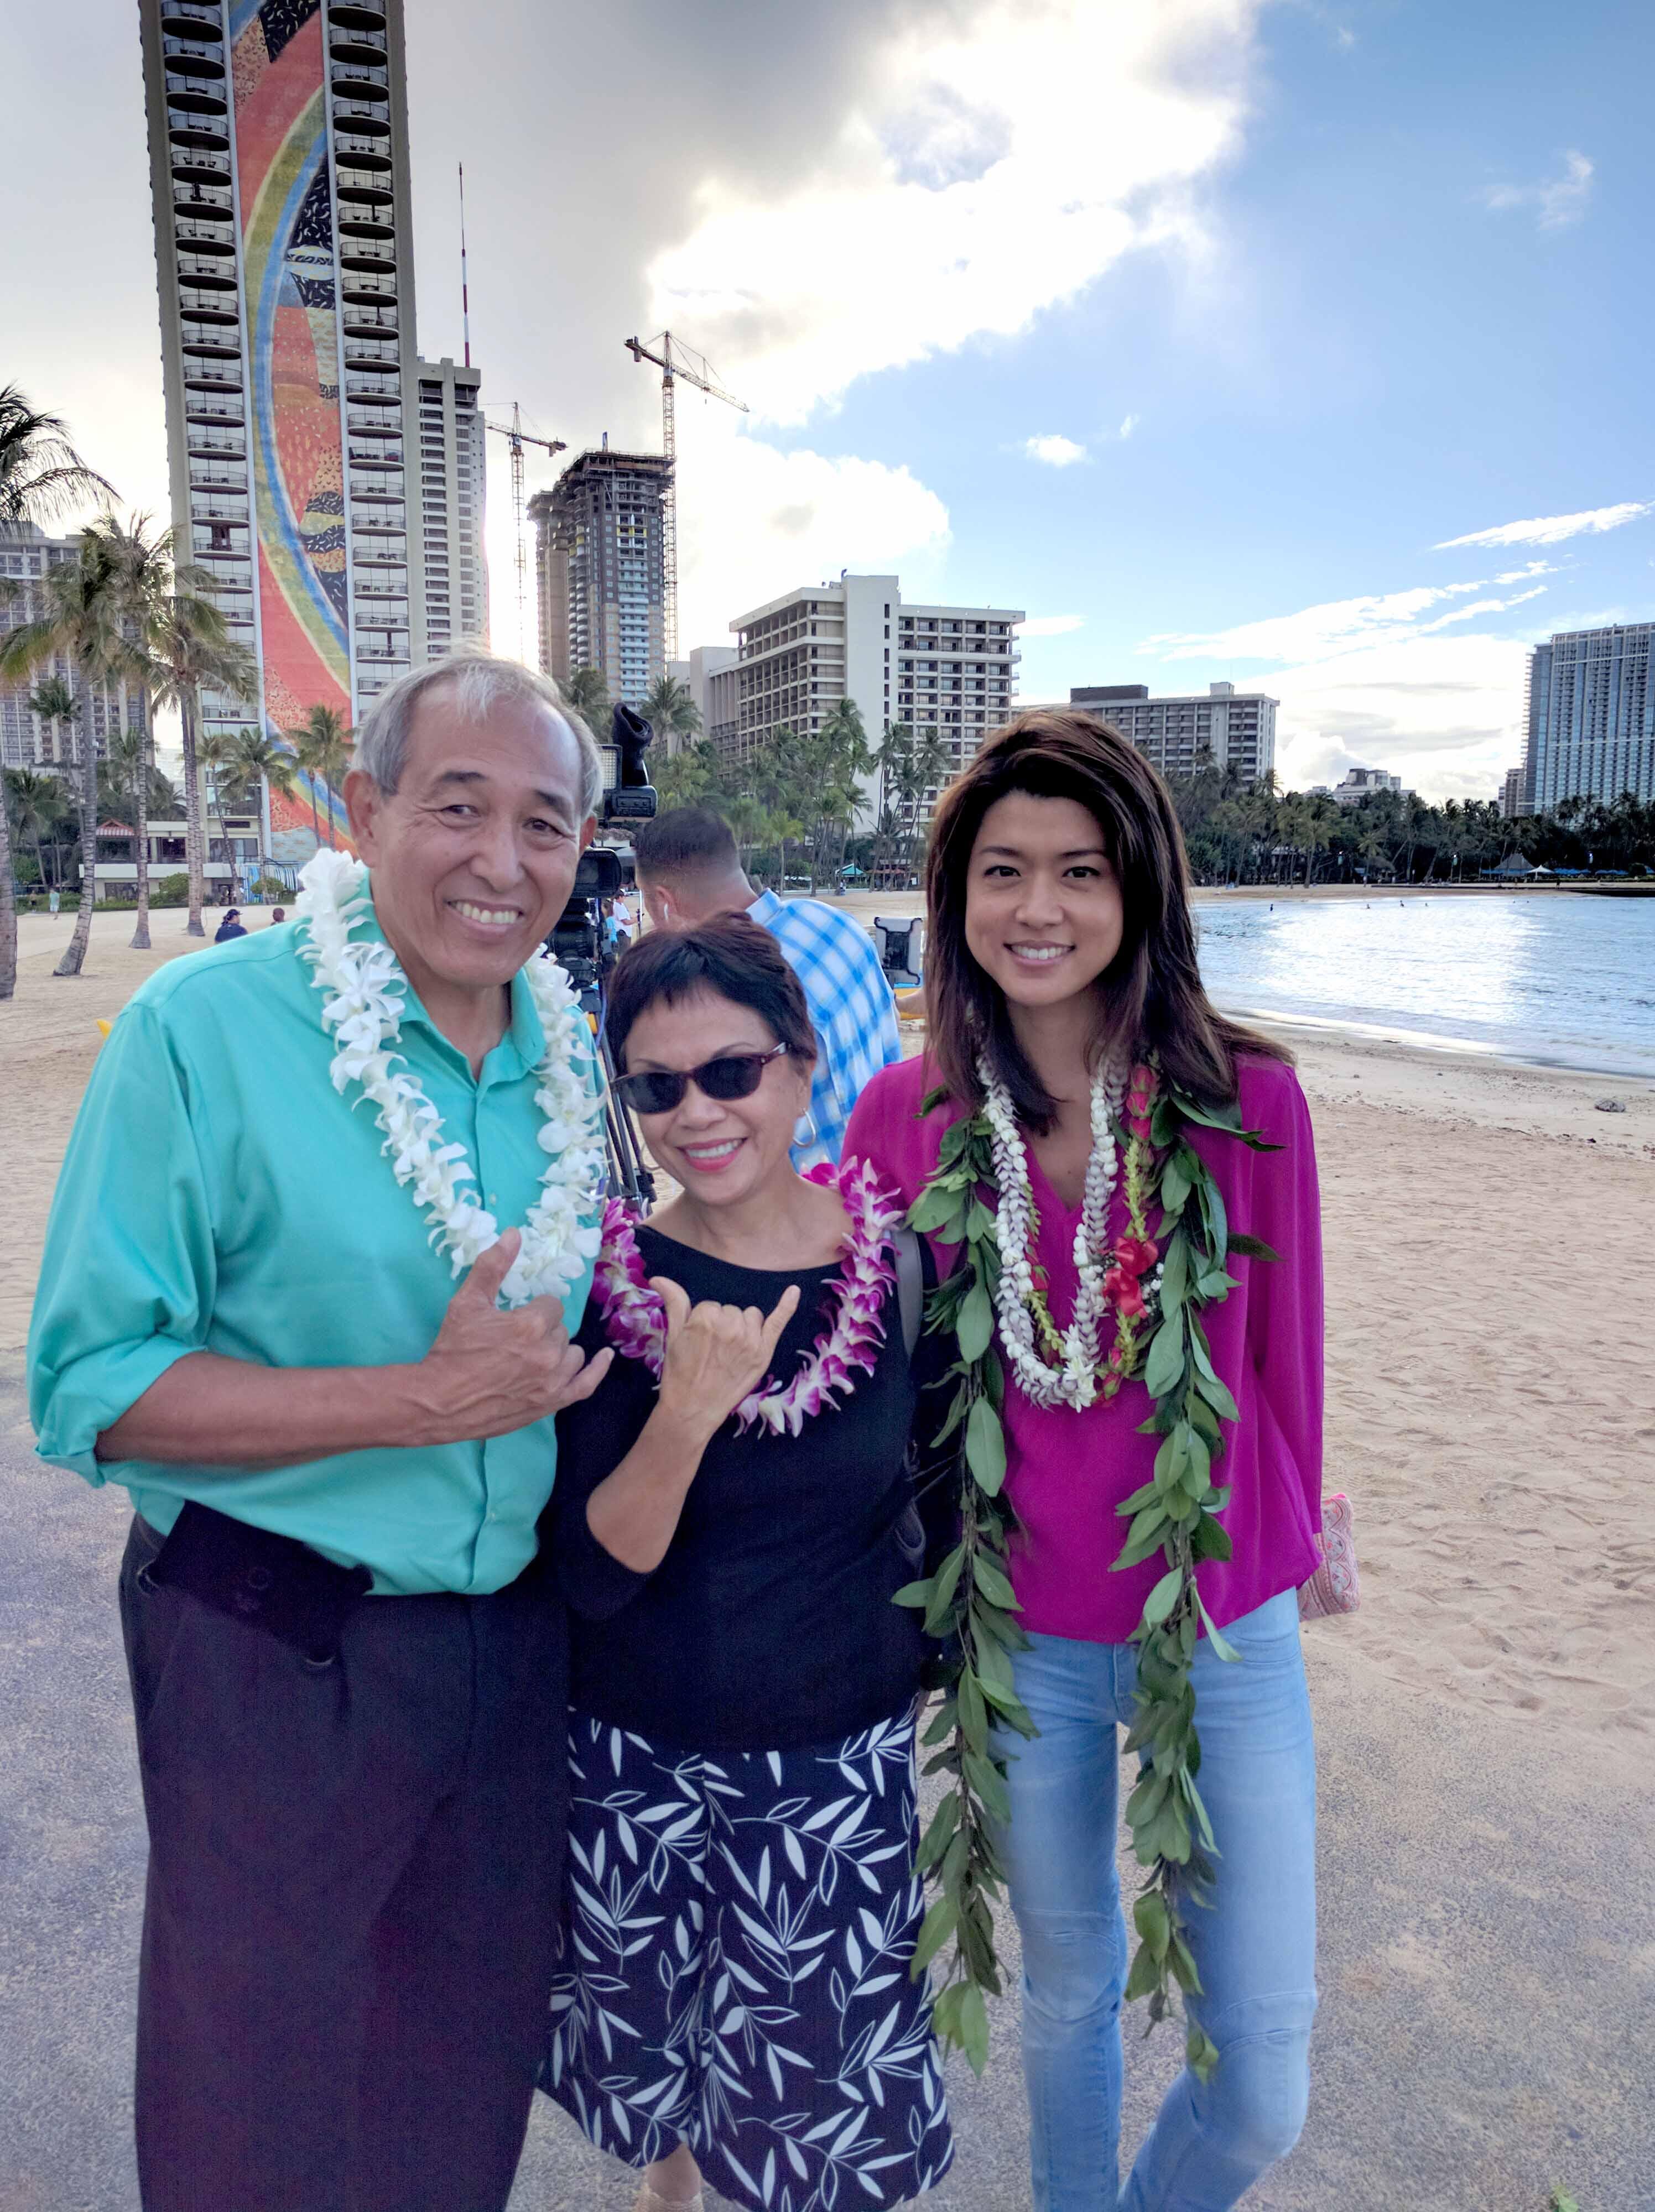 Dennis Chun, Brenda_Ching and Grace Park at the Hawaii 5-0 blessing of season 7.